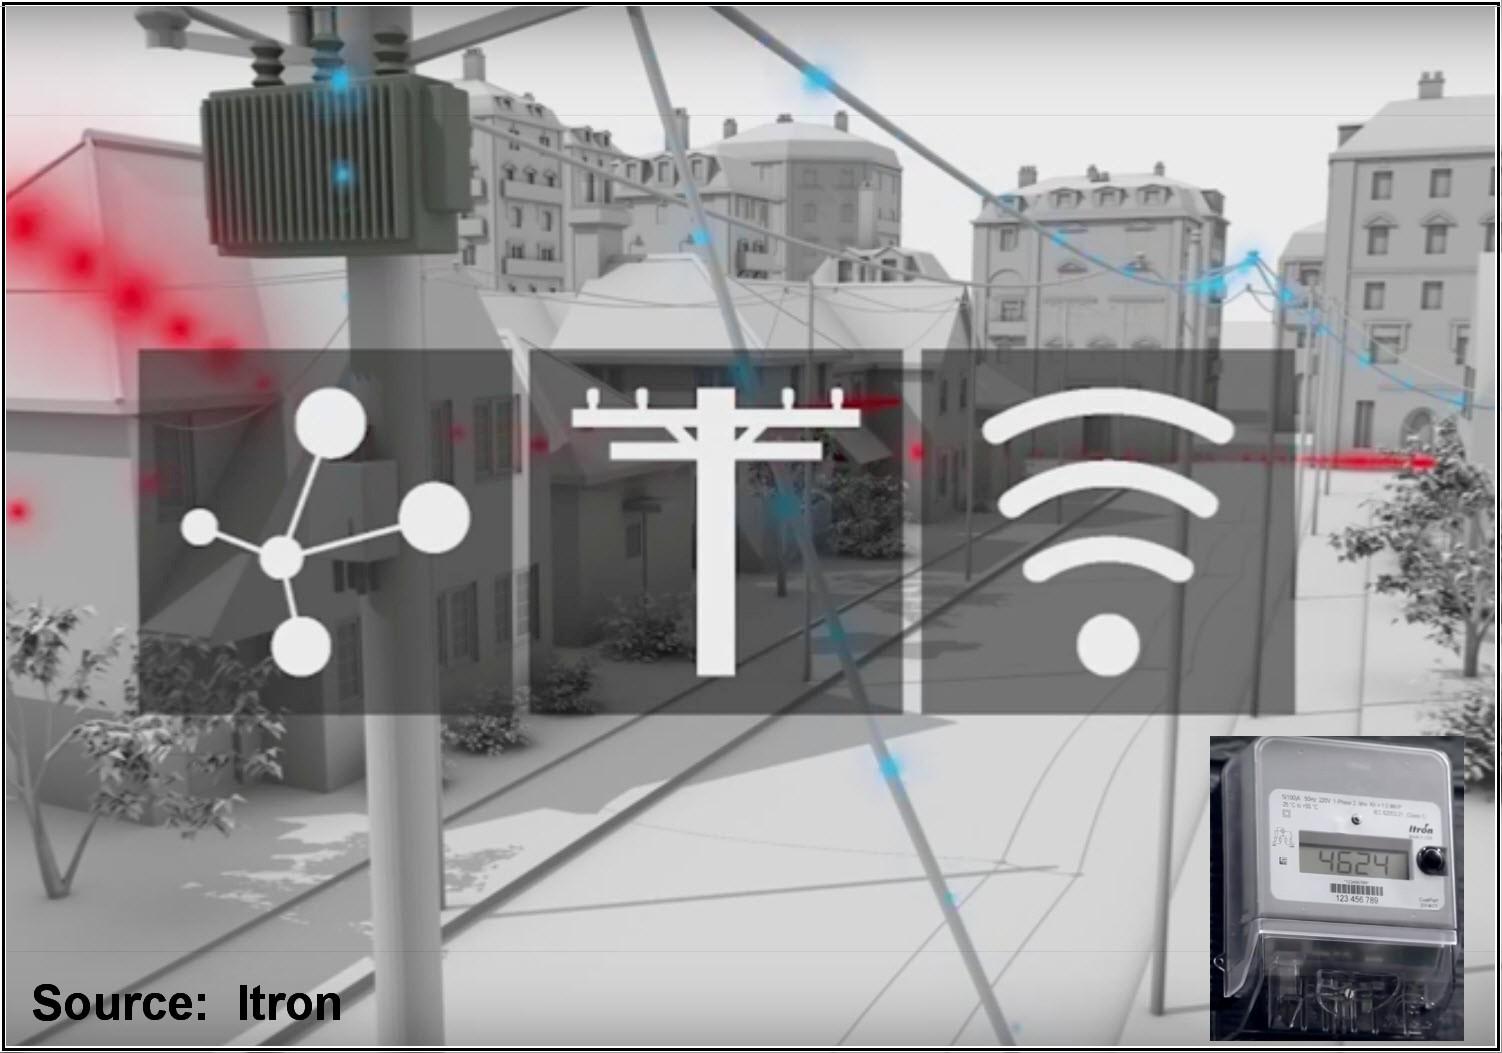 New Itron OpenWay Riva 'Smart' Meters Combine RF Mesh, PLC